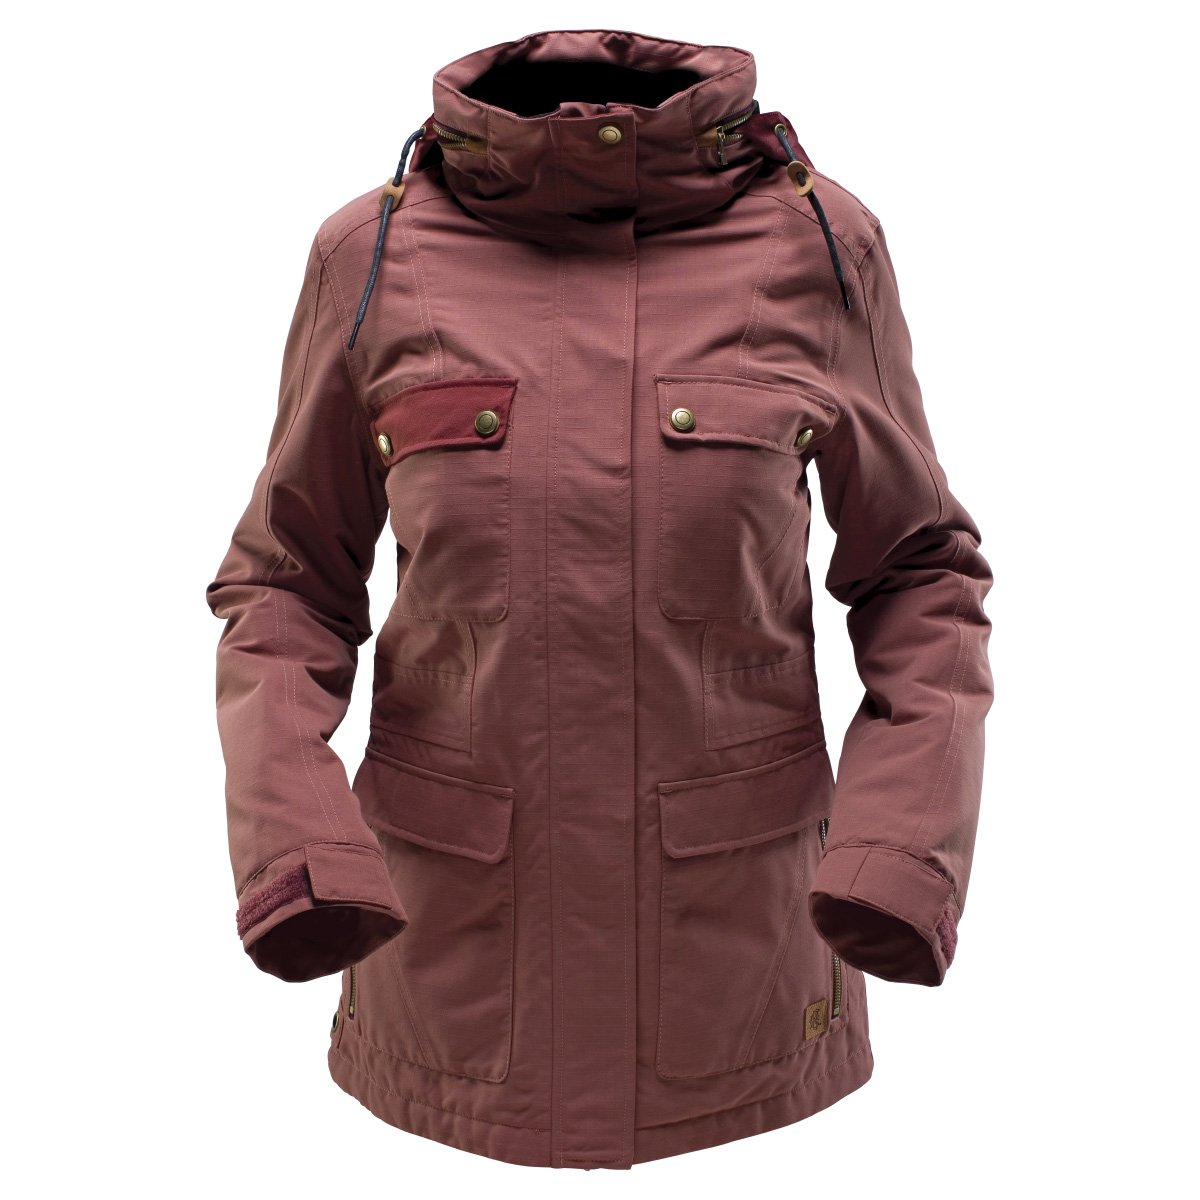 Damen Snowboard Jacke Cappel Secret Jacket jetzt bestellen